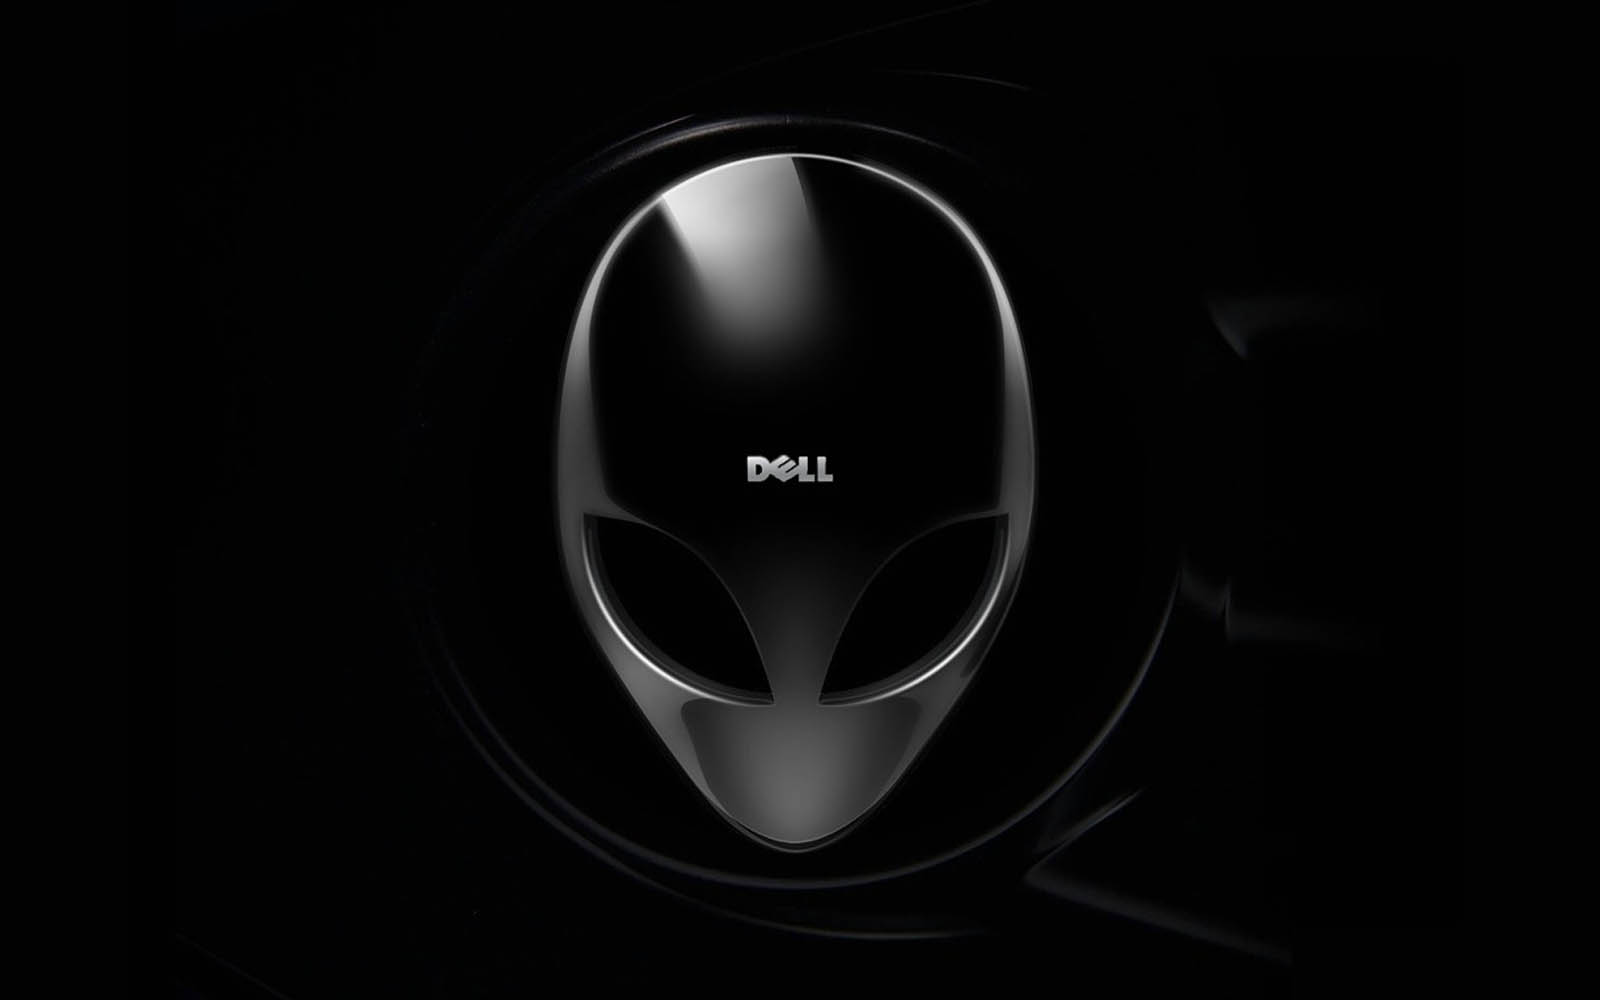 Dell Wallpaper Windows 10 72 Images: Dell Wallpaper Windows 7 Free